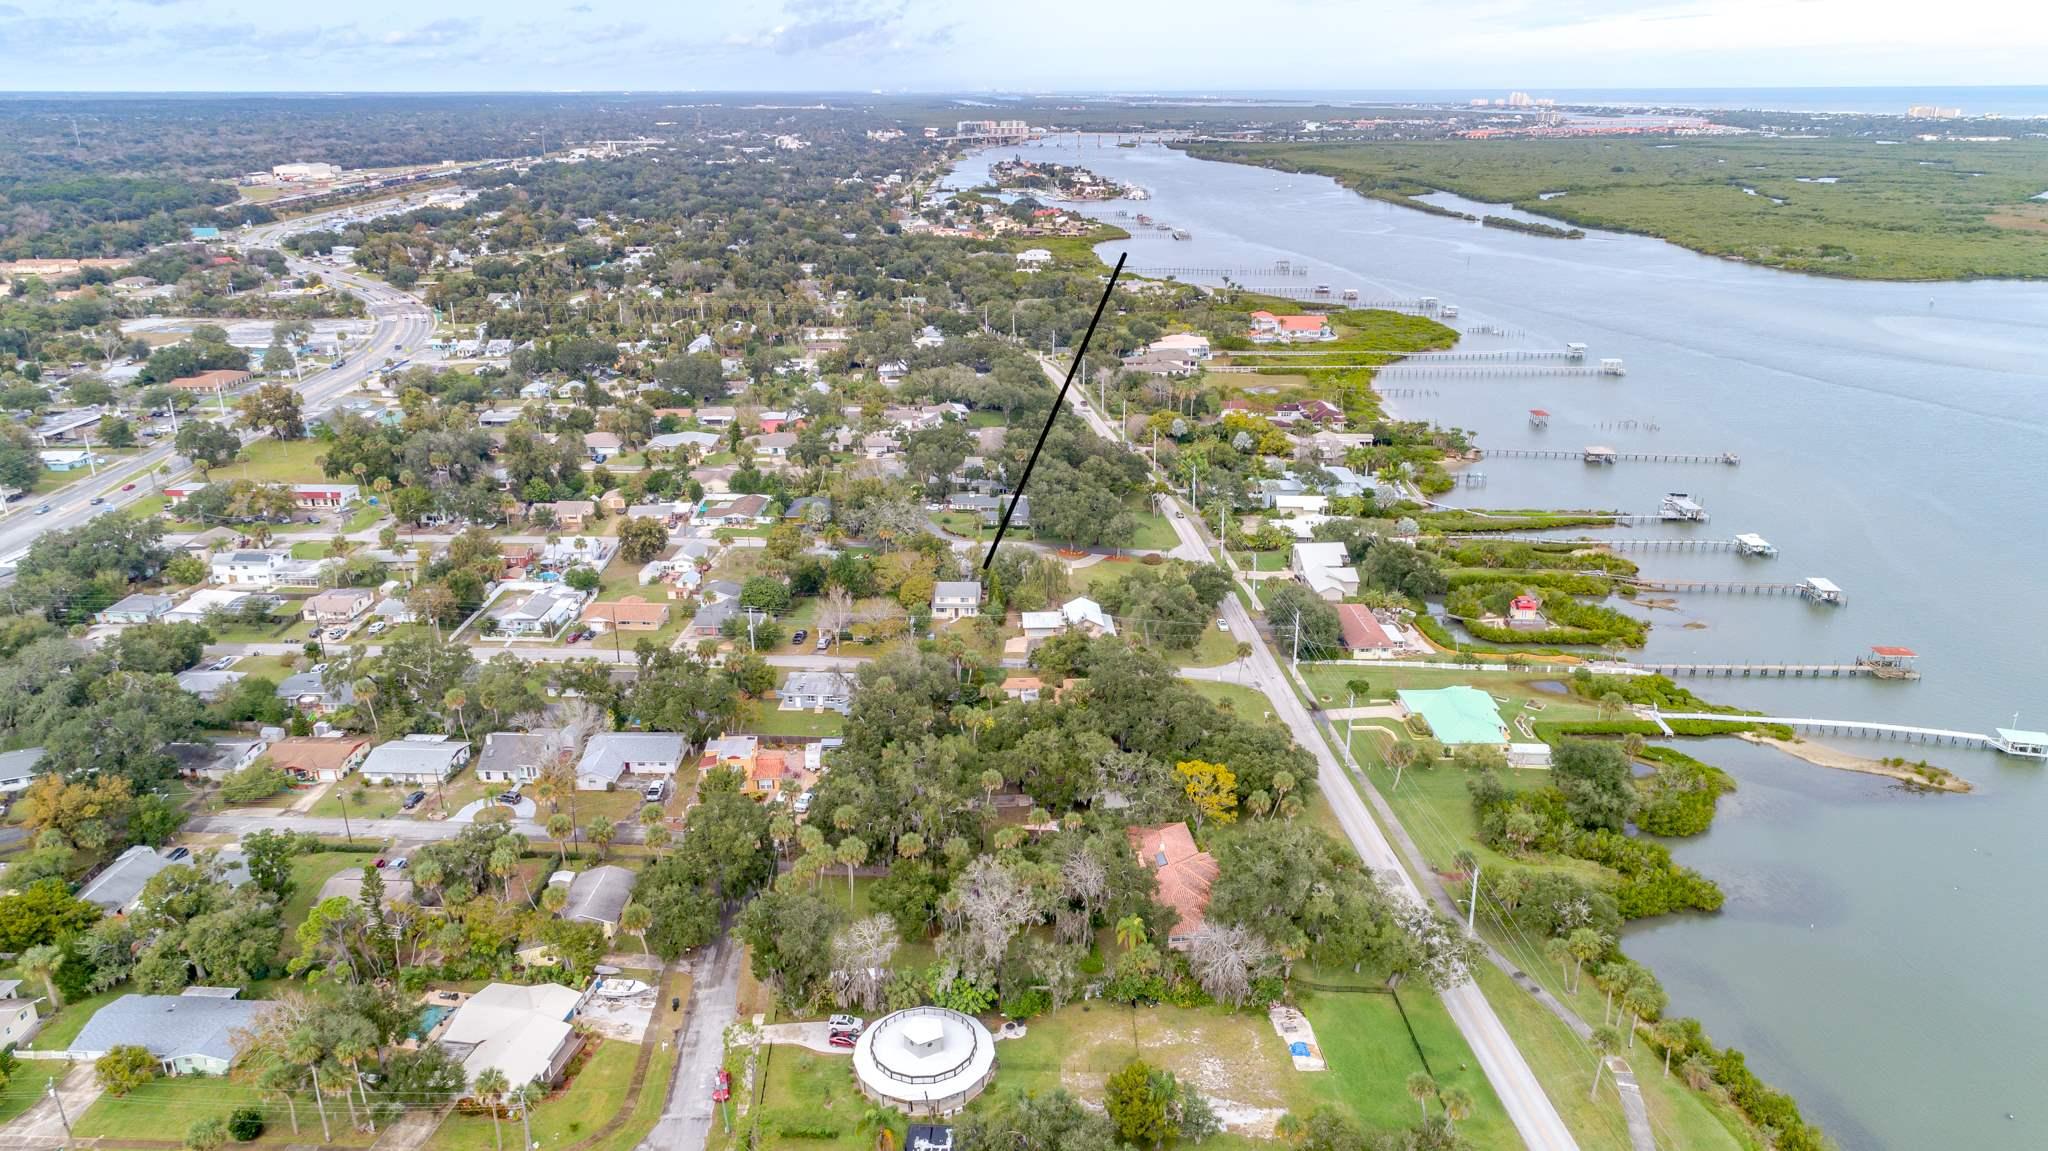 428 N Riverside Dr, Edgewater, FL 32132